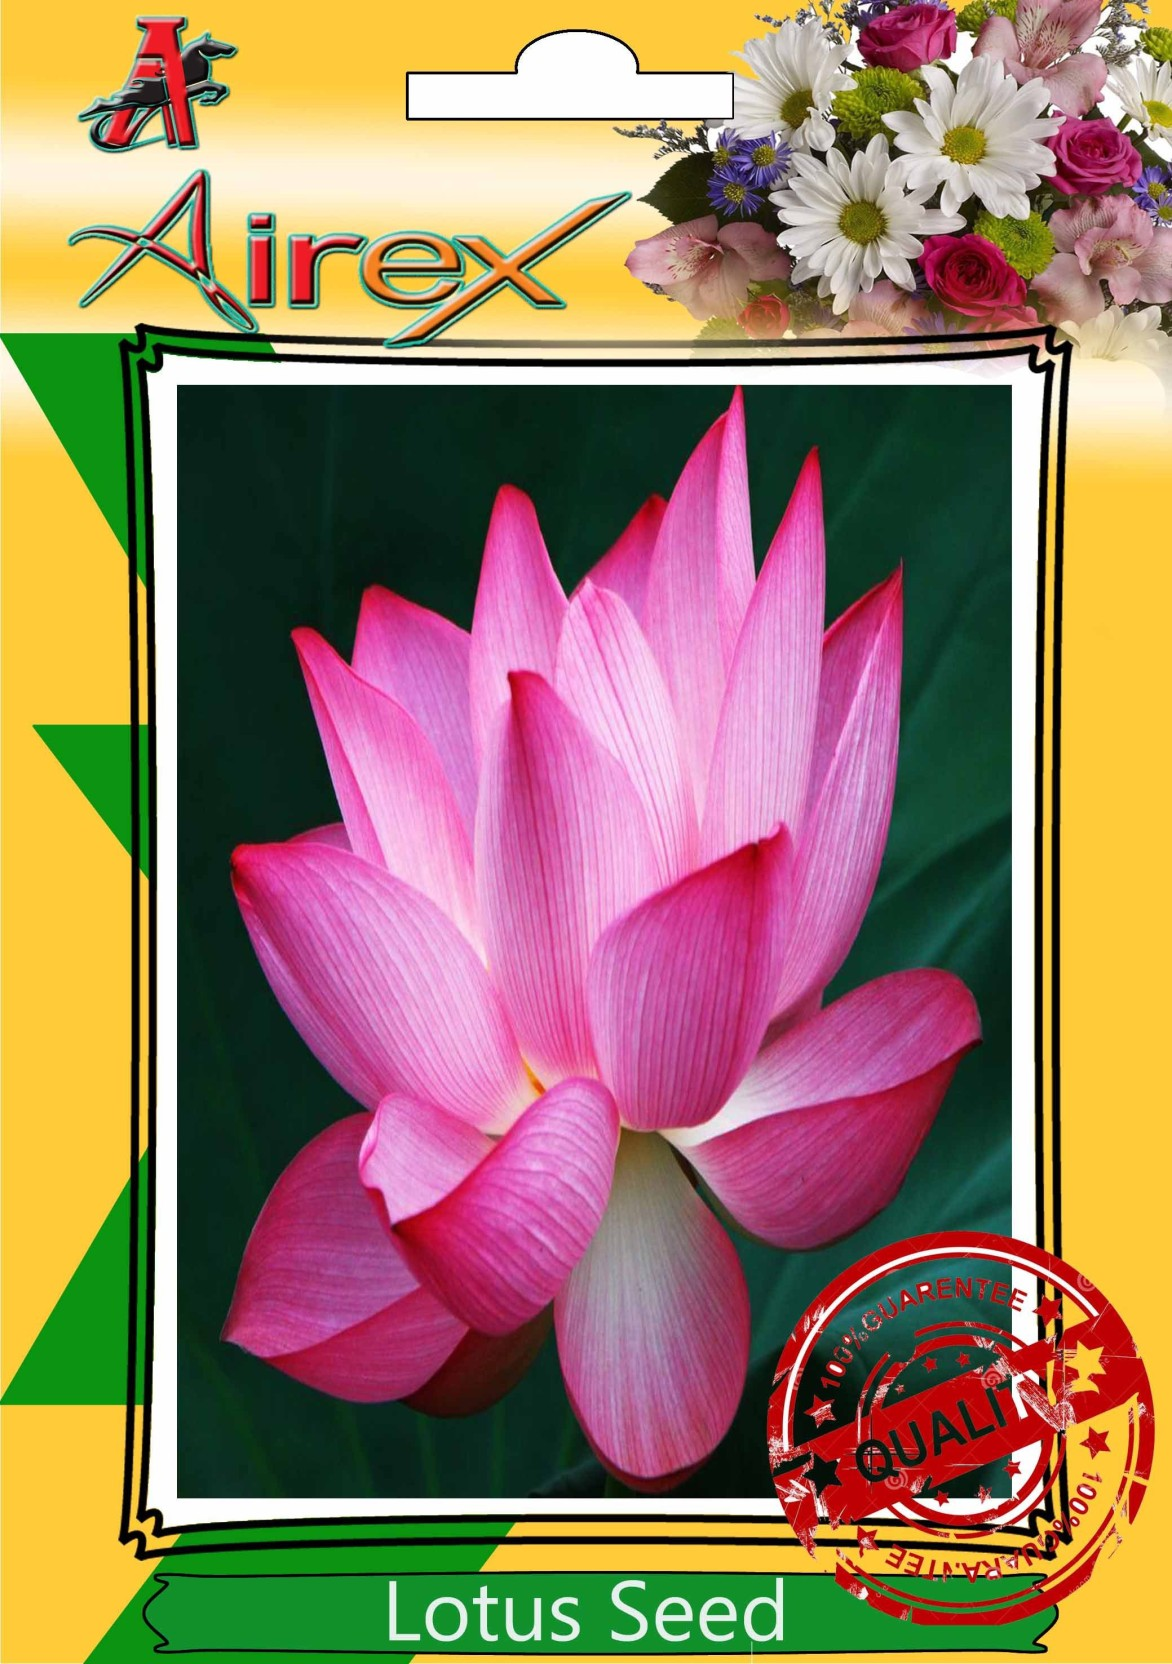 Airex lotus flower seed price in india buy airex lotus flower seed airex lotus flower seed add to cart izmirmasajfo